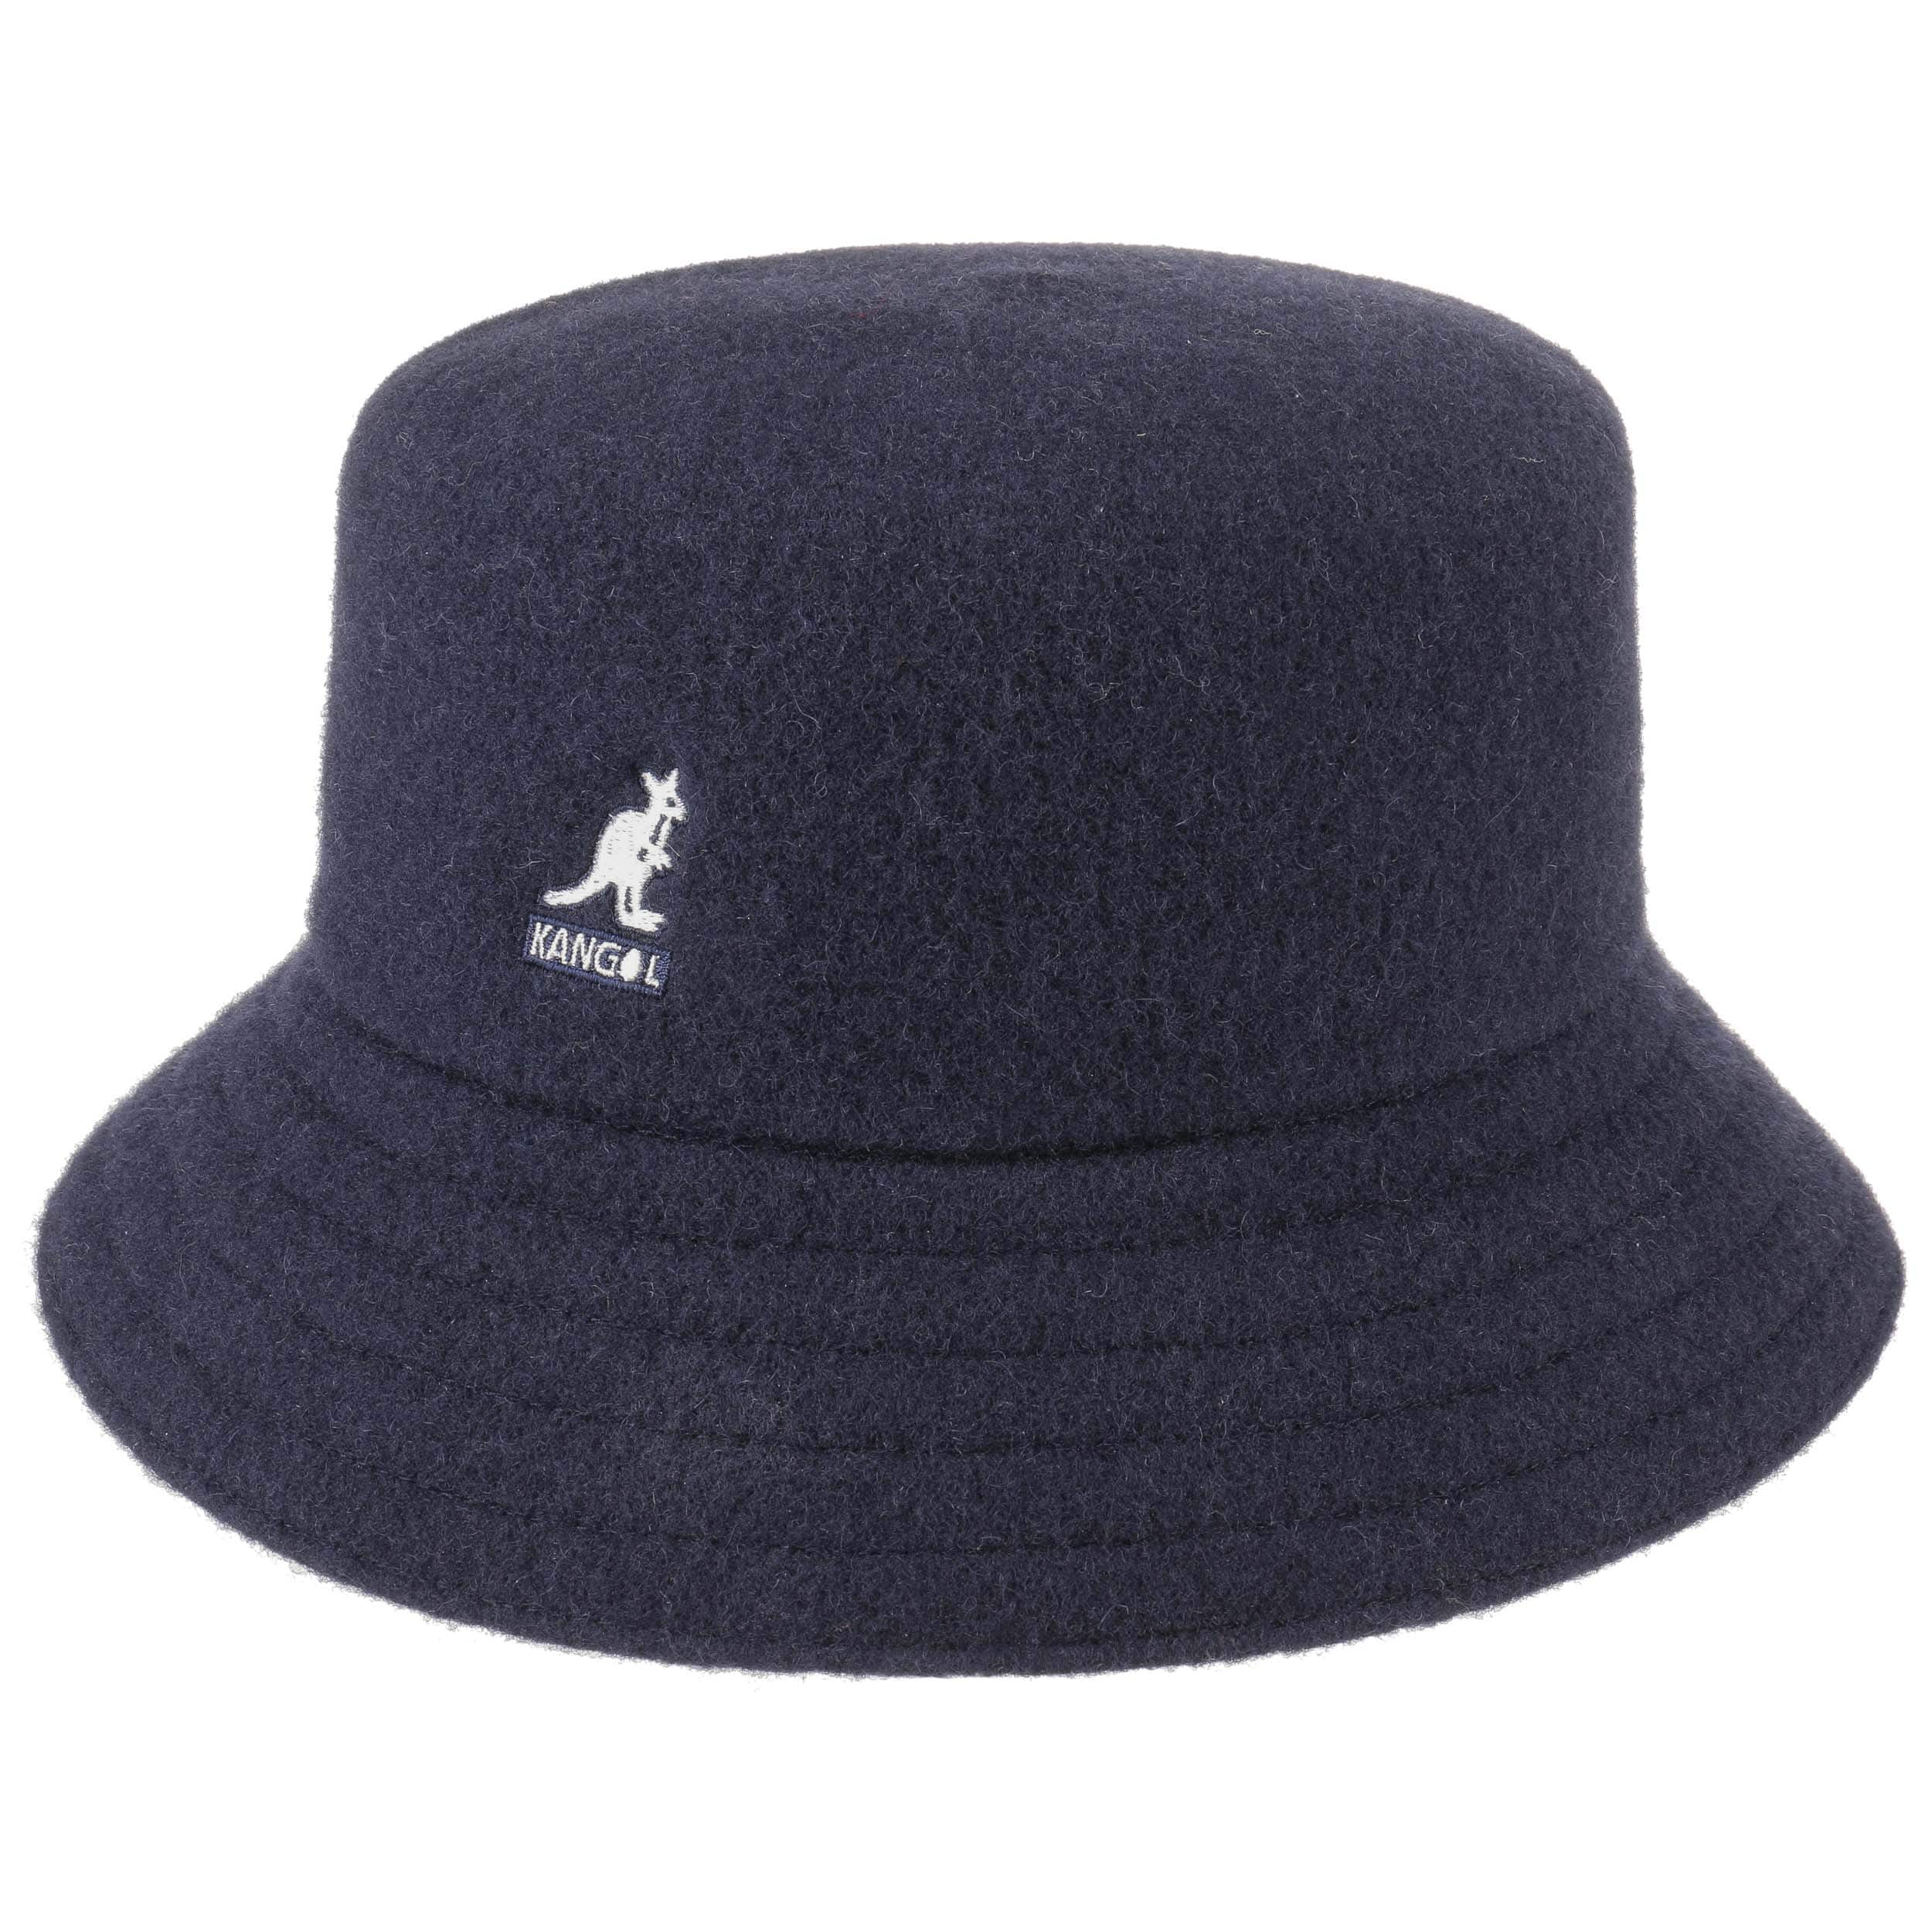 Wool Lahinch Bucket Hat. by Kangol 84ab1f1ea53